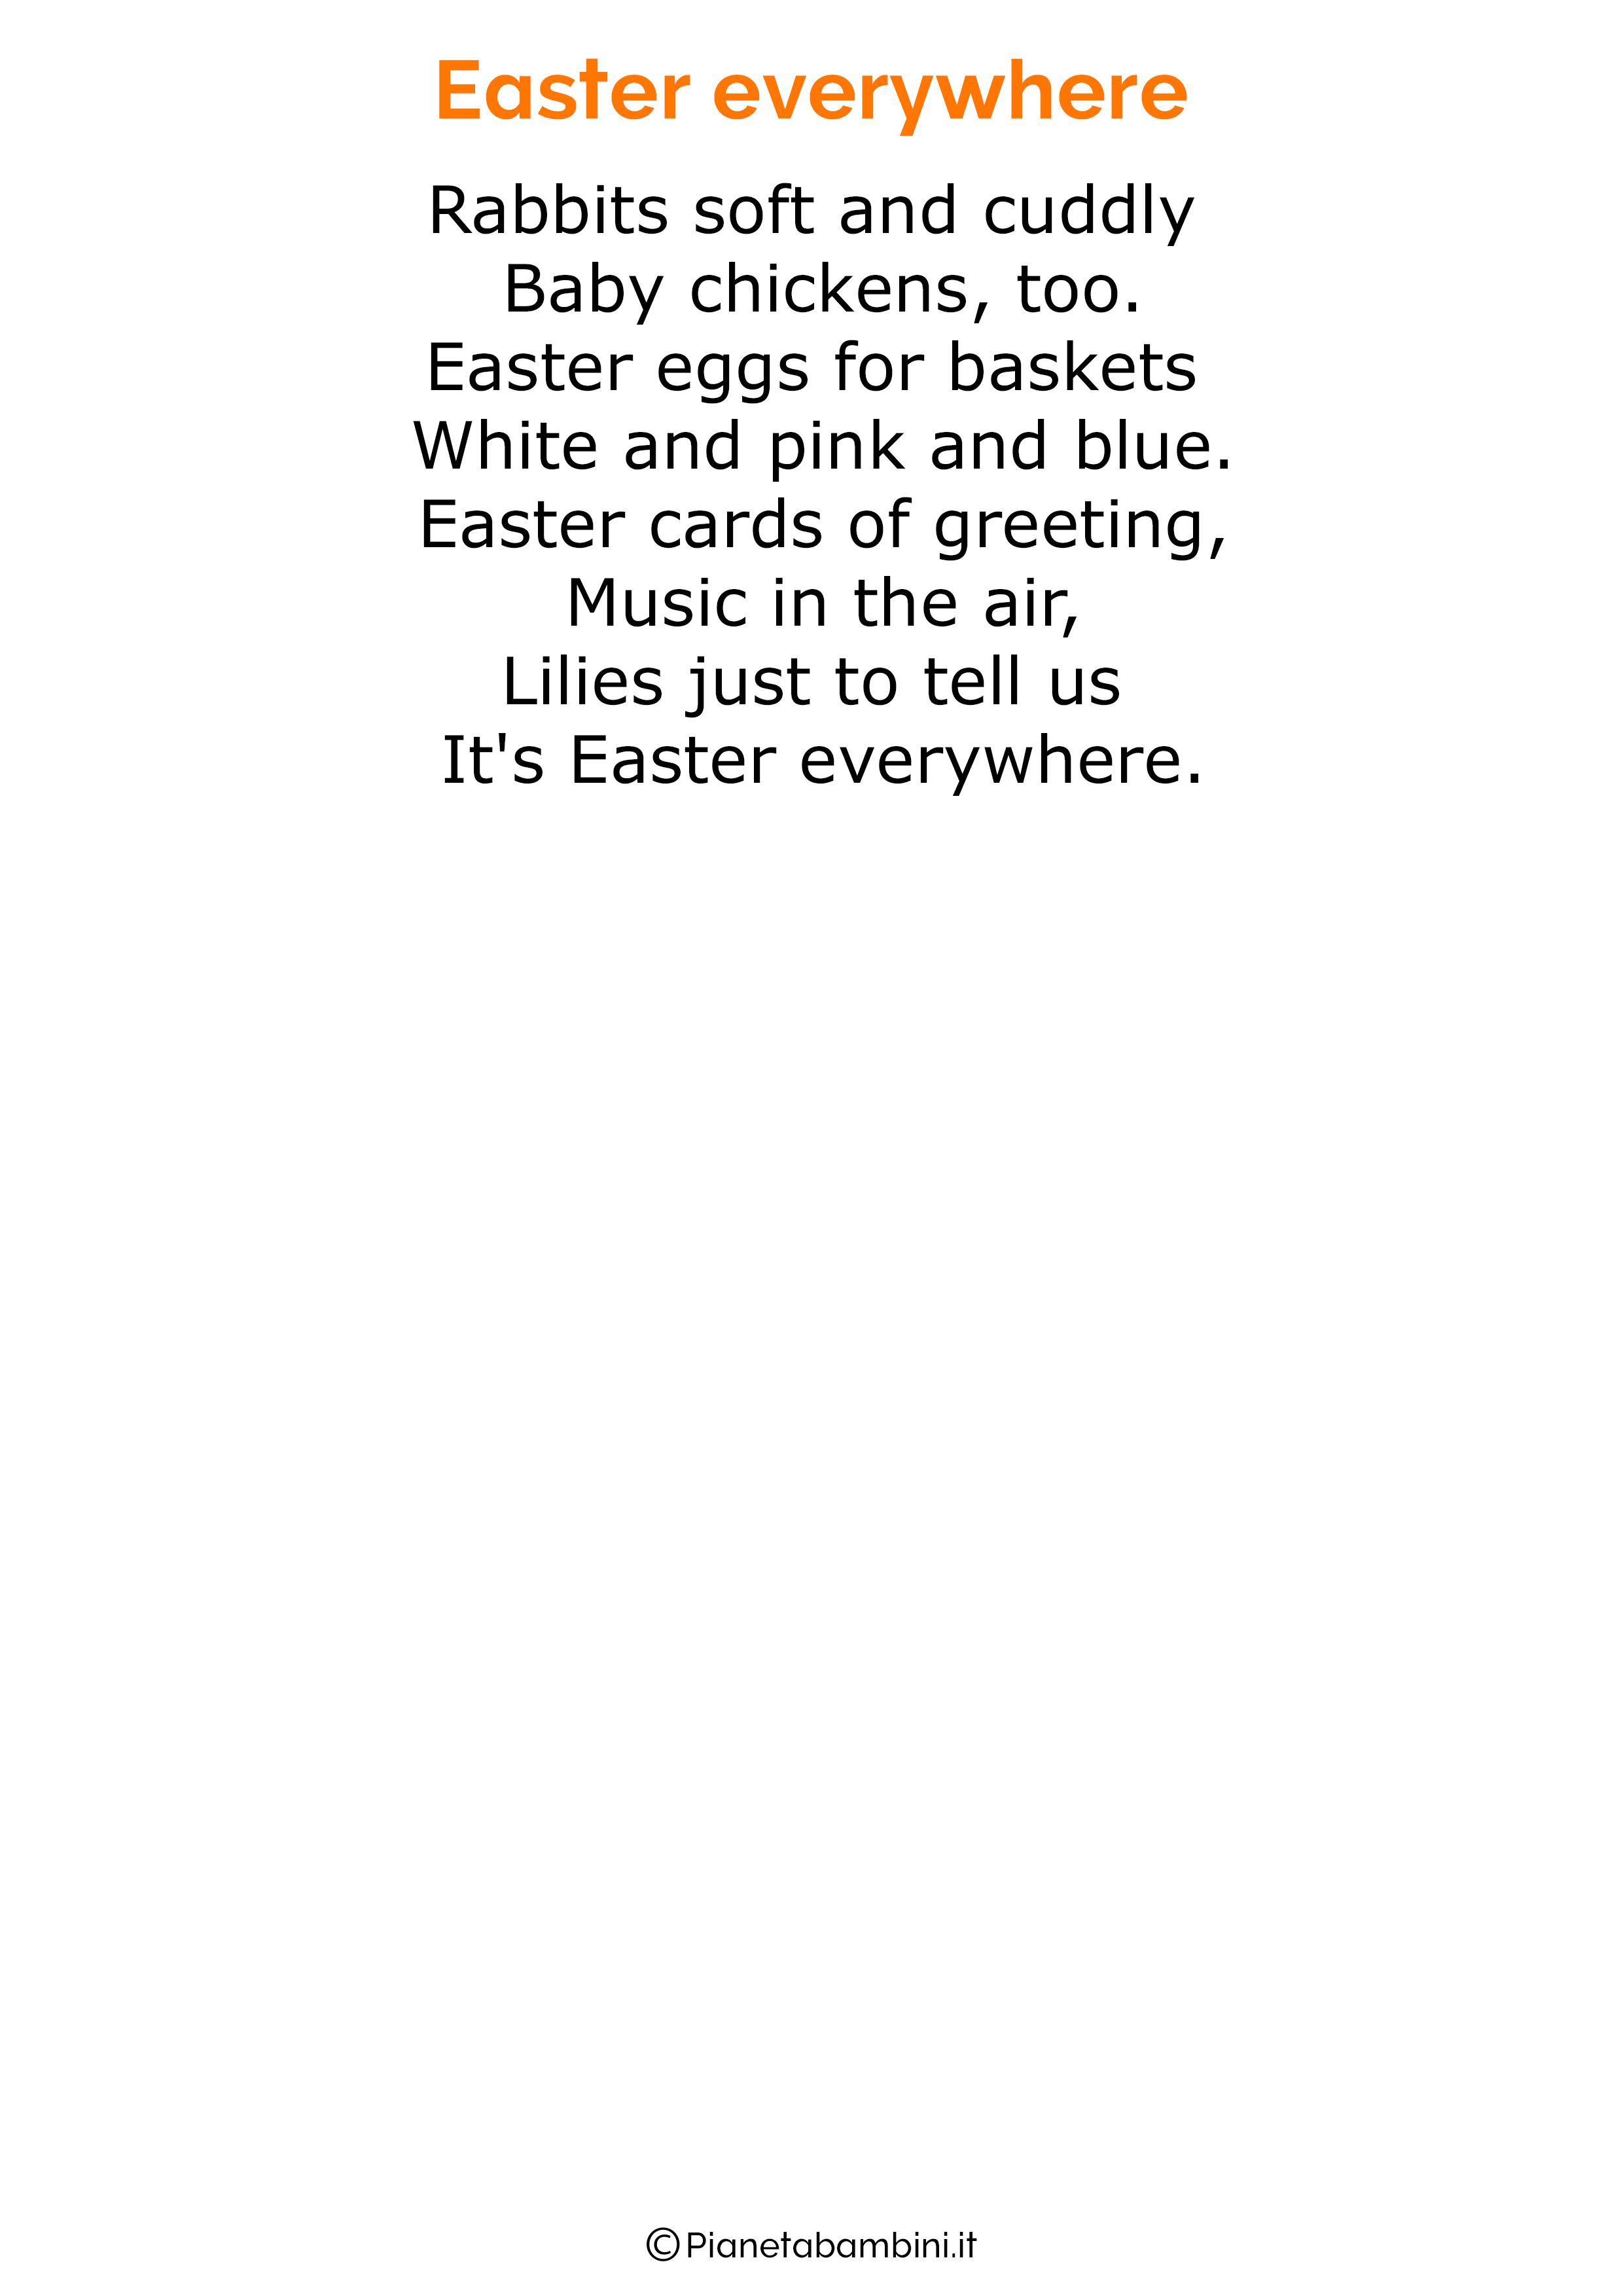 Poesie di Pasqua in inglese per bambini 19